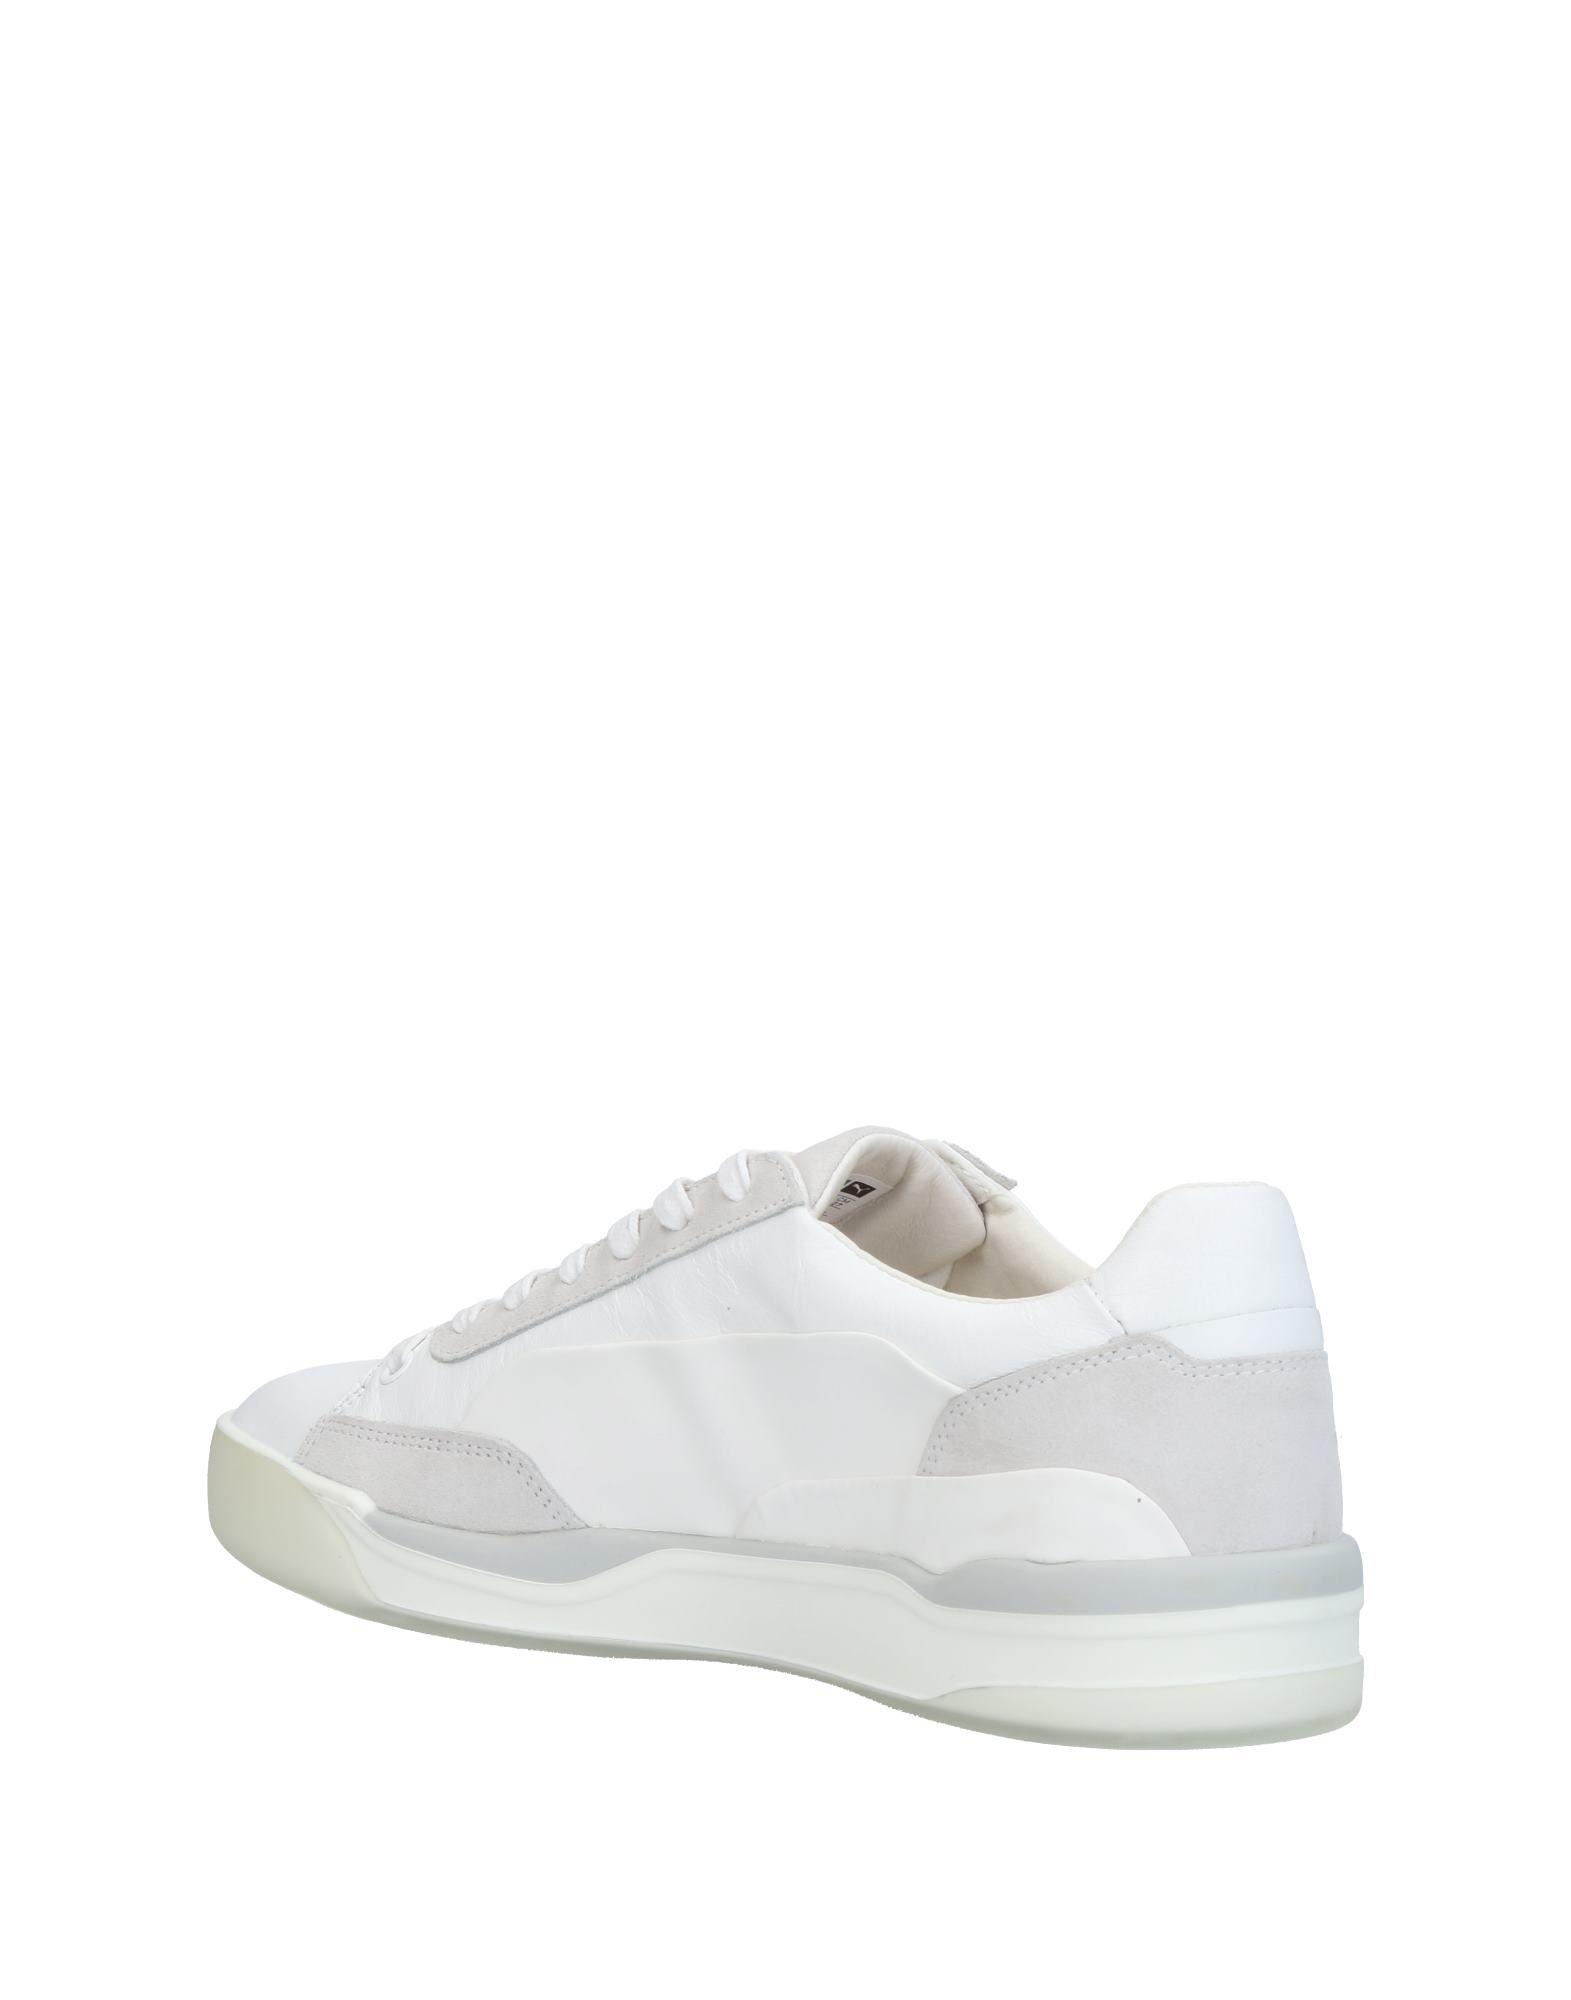 Sneakers Mcq Puma Homme - Sneakers Mcq Puma sur